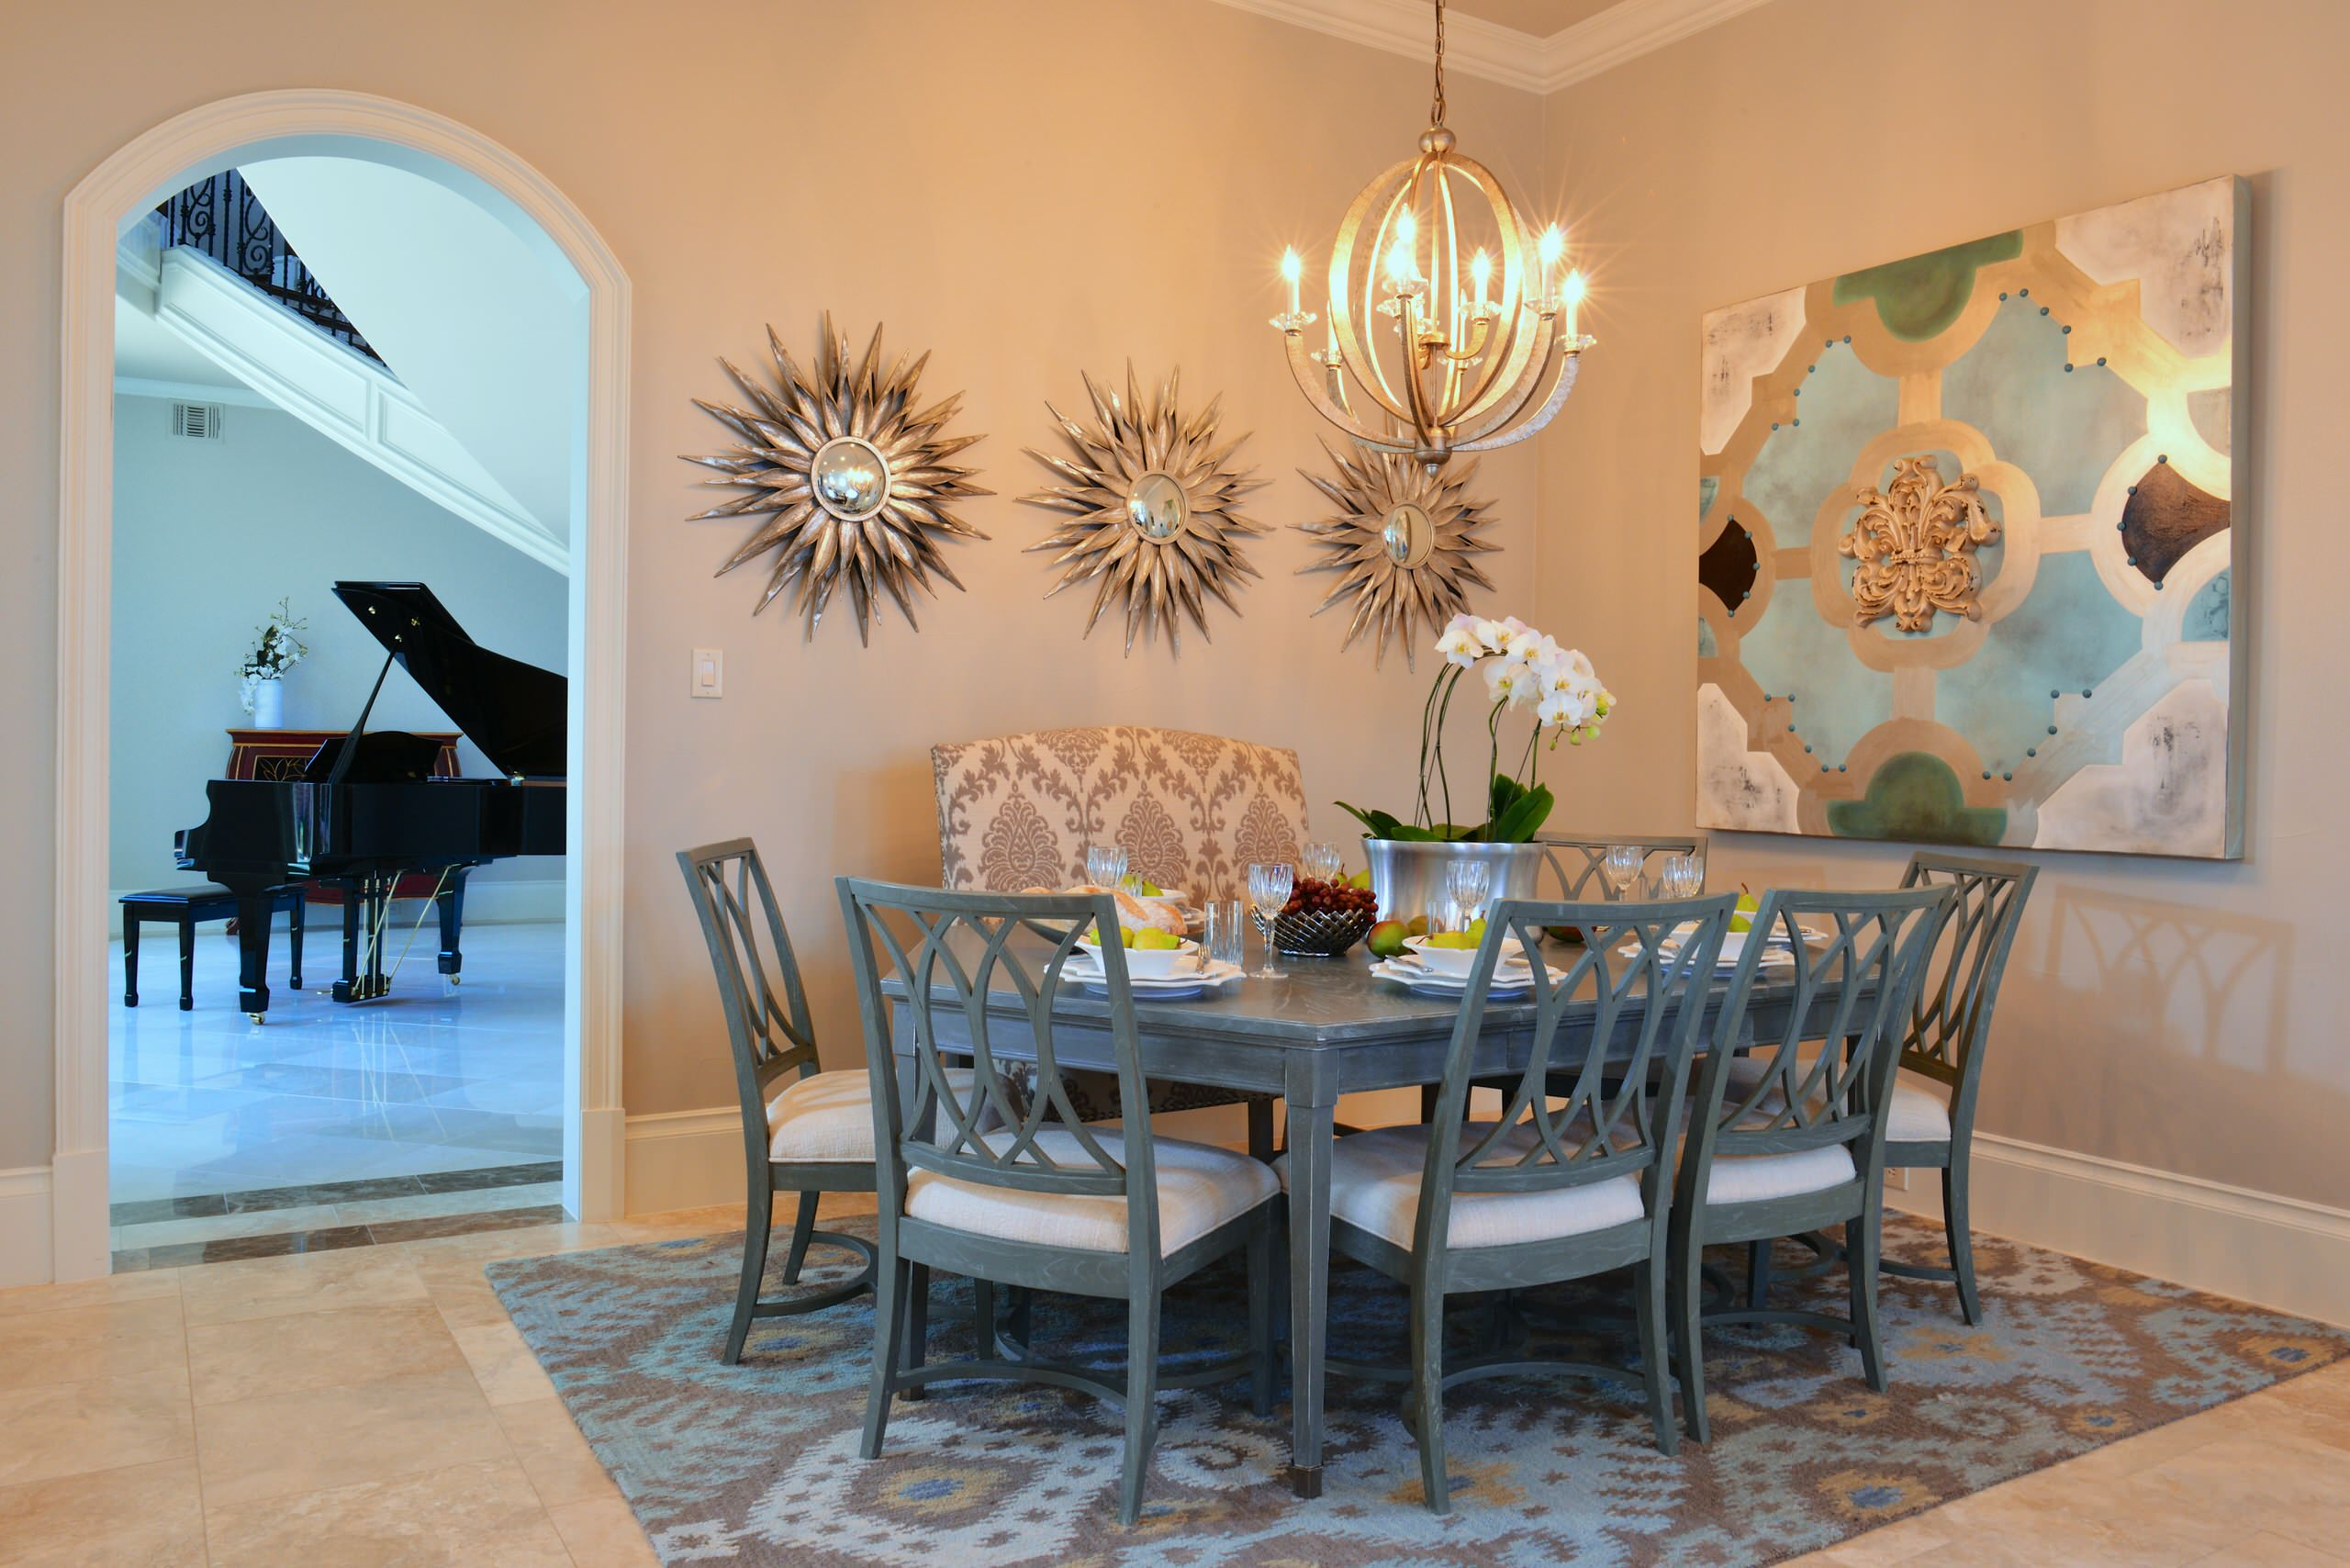 Hexagon Dining Table Houzz, Hexagon Dining Room Table